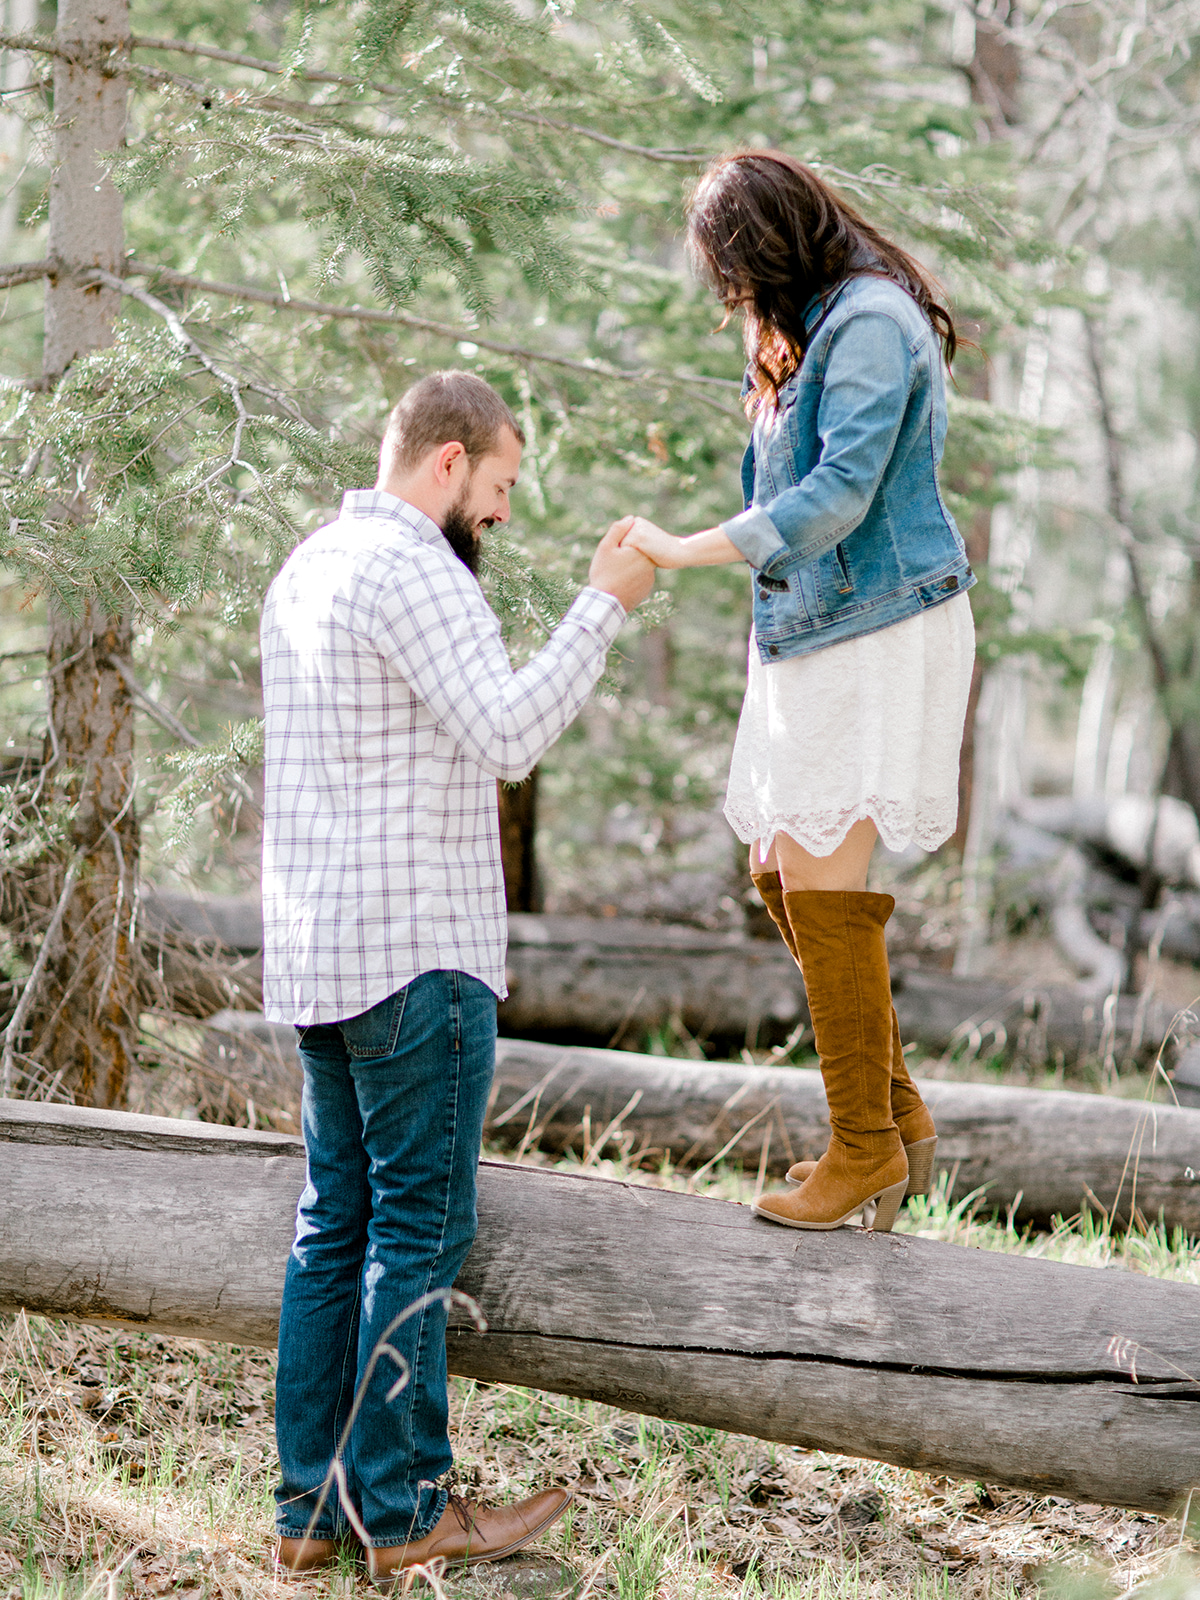 An Overseas Engagement, Followed by a Dreamy Northern Arizona Photoshoot: Kellye & Trevor- Konsider It Done- AZ Arizona Wedding & Event Planner, Designer, Coordinator Planning in Scottsdale, Phoenix, Paradise Valley, Tempe, Gilbert, Mesa, Chandler, Tucson, Sedona